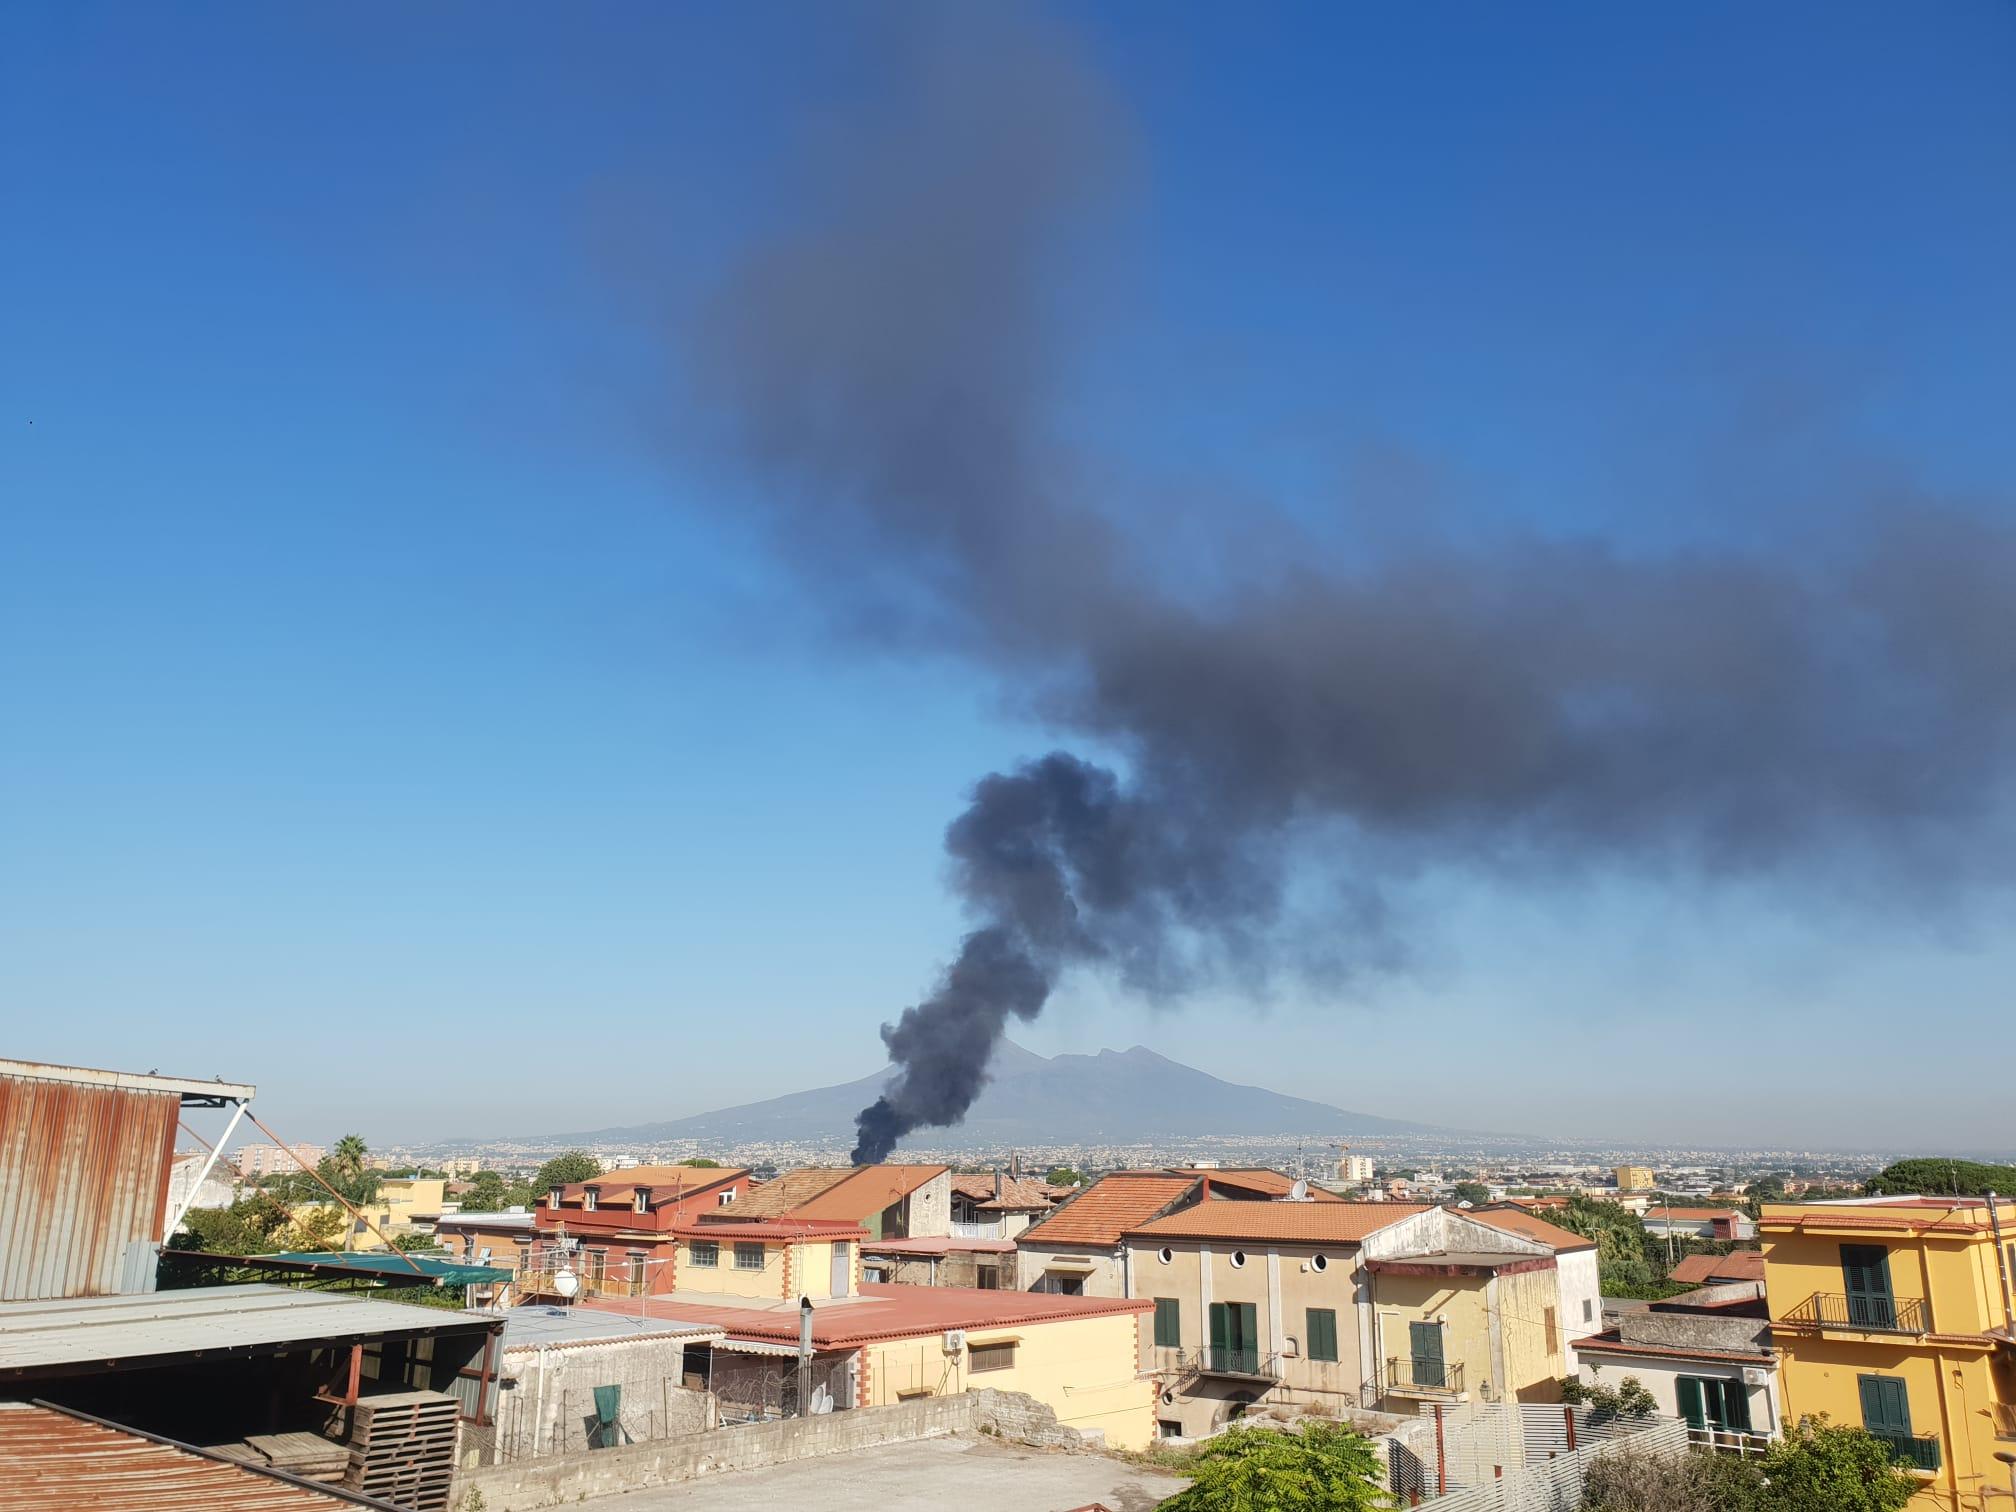 ANGRI: PAUROSO INCENDIO, ARIA IRRESPIRABILE